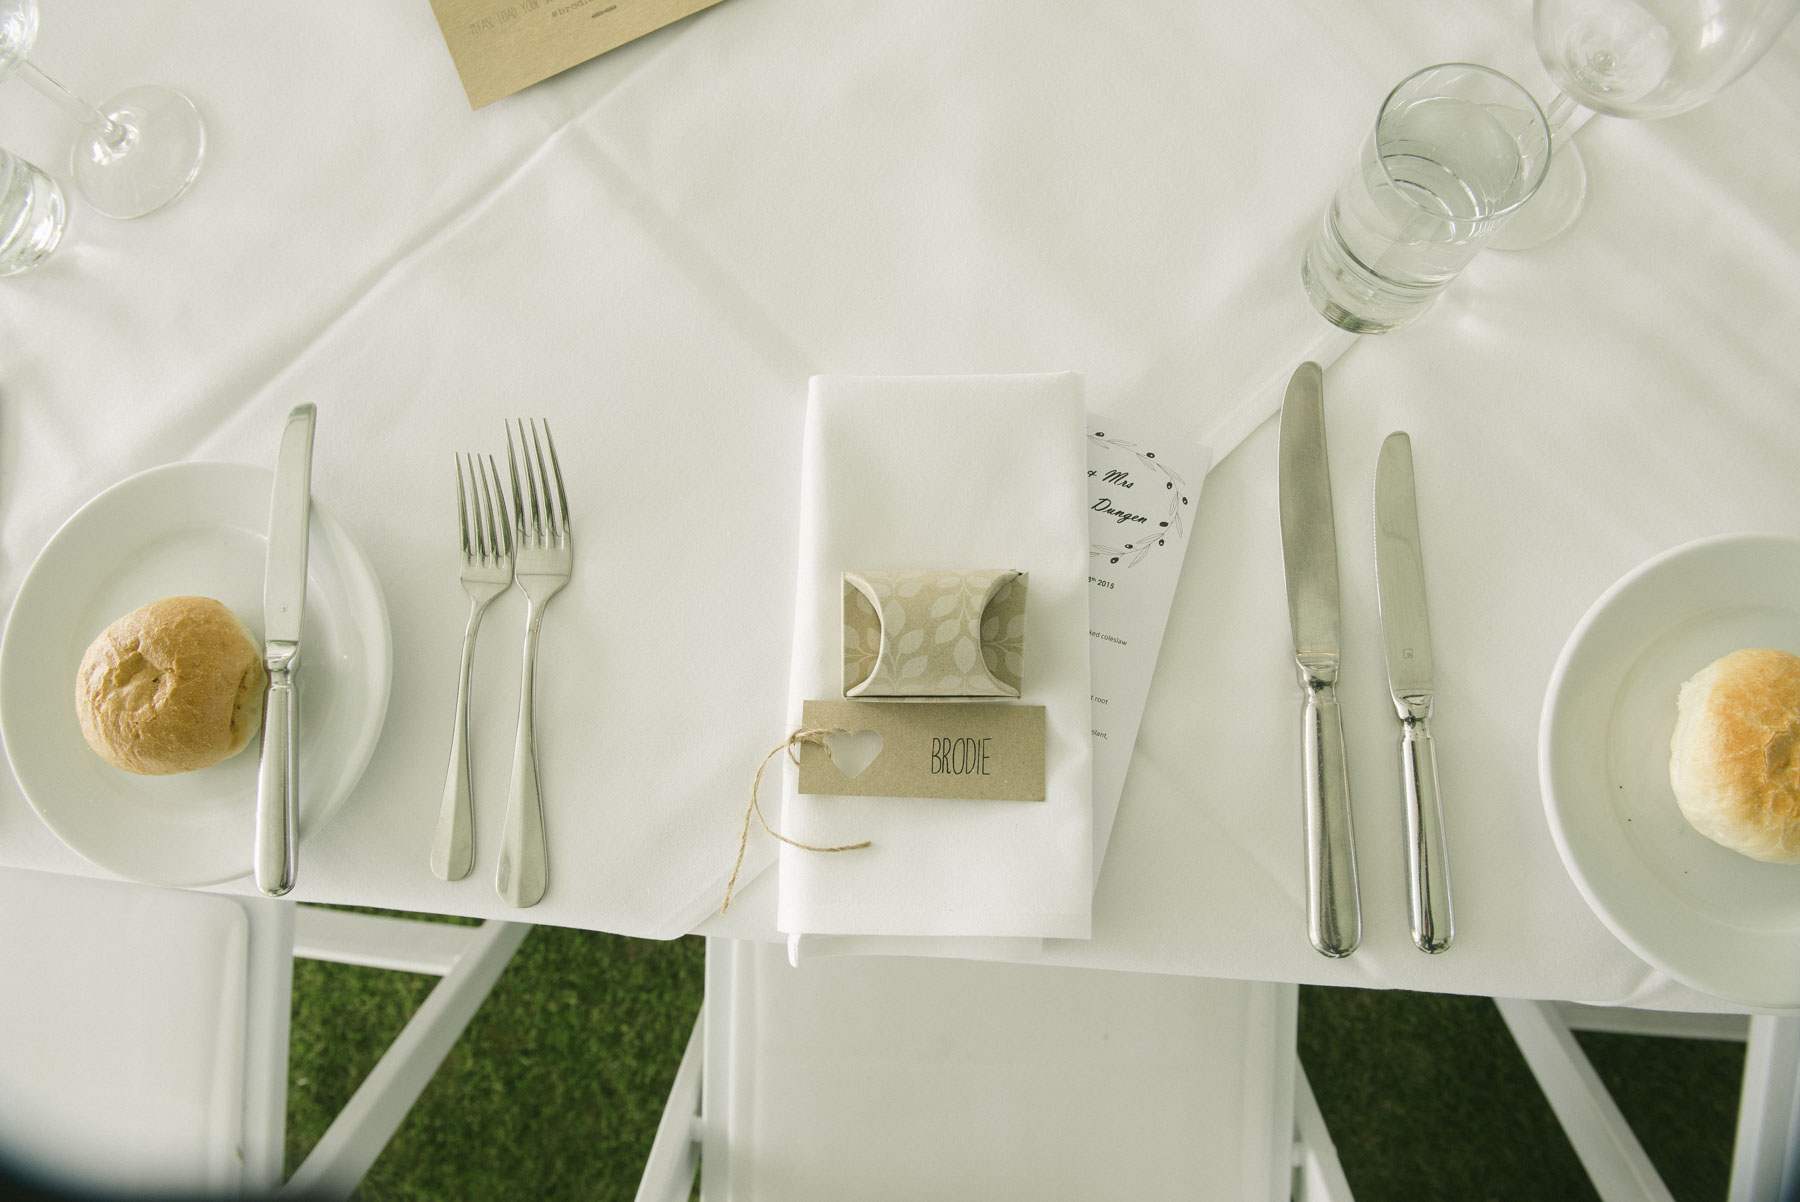 1501vand-284alan_moyle_wedding_portrait_brighton_bayside_werribee_estate_mansion_zoo_rustic_styled_garden_mansion_candid_documentry_victoria_whitelaw.jpg